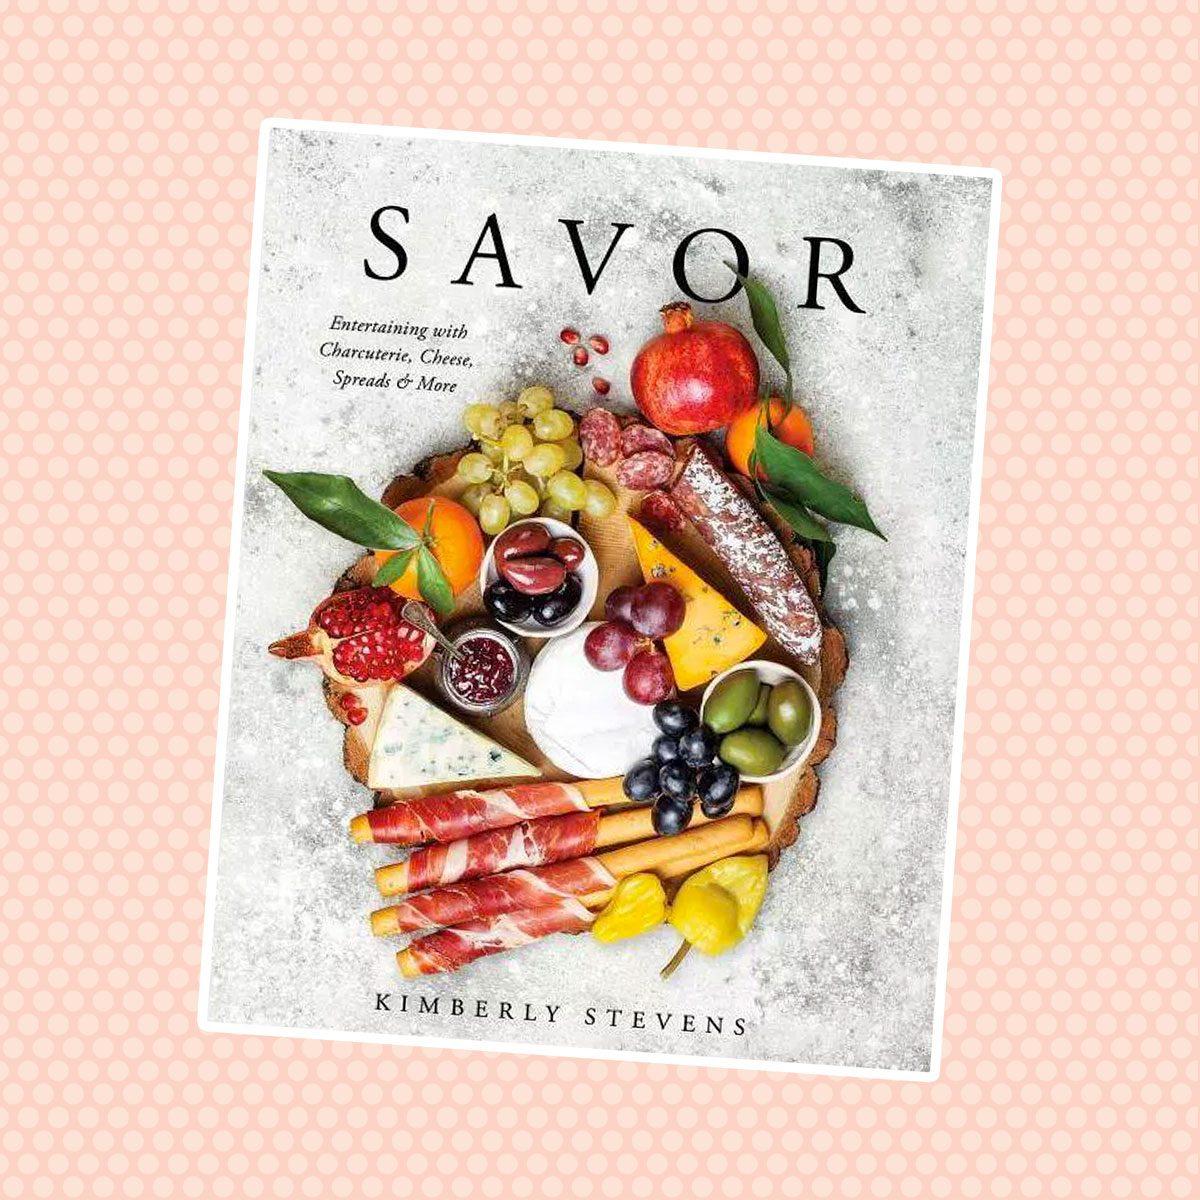 Savor - by Kimberly Stevens (Hardcover)